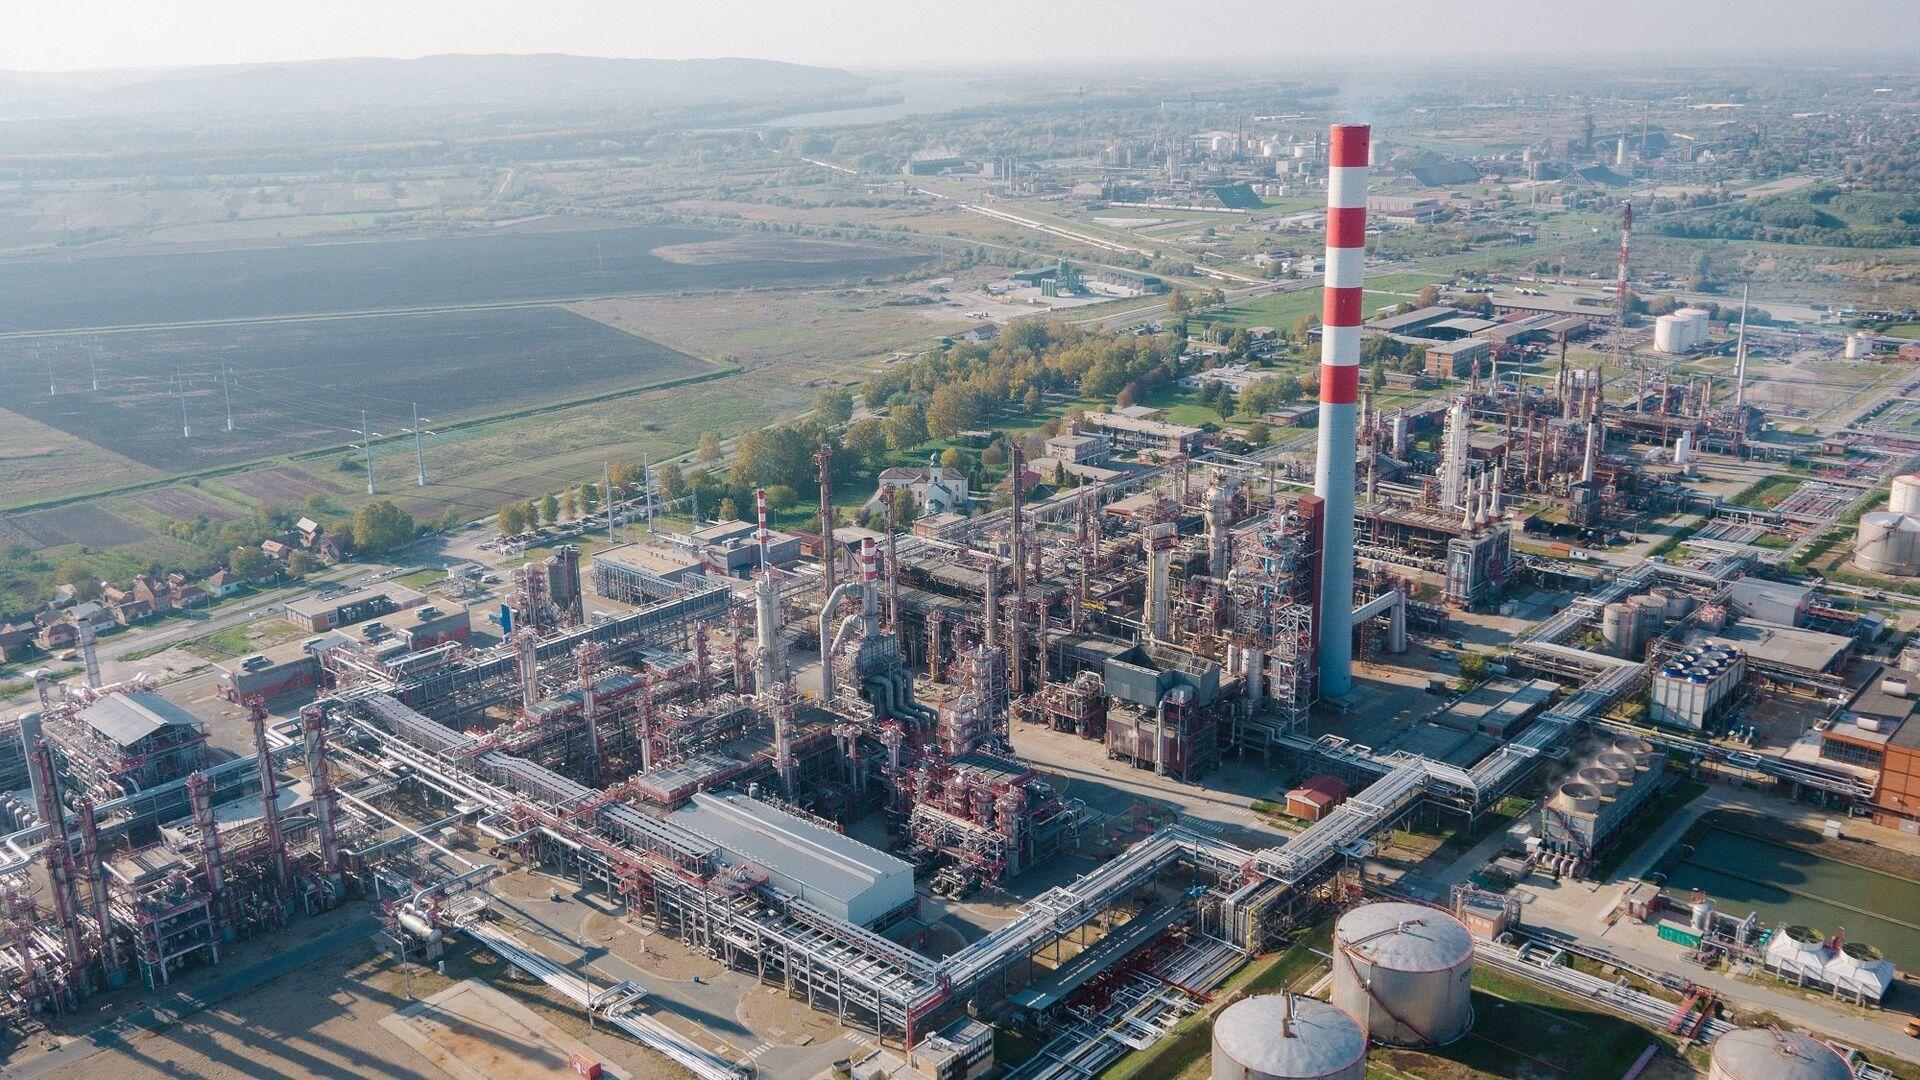 Rafinerija nafte u Pančevu - Sputnik Srbija, 1920, 13.10.2021